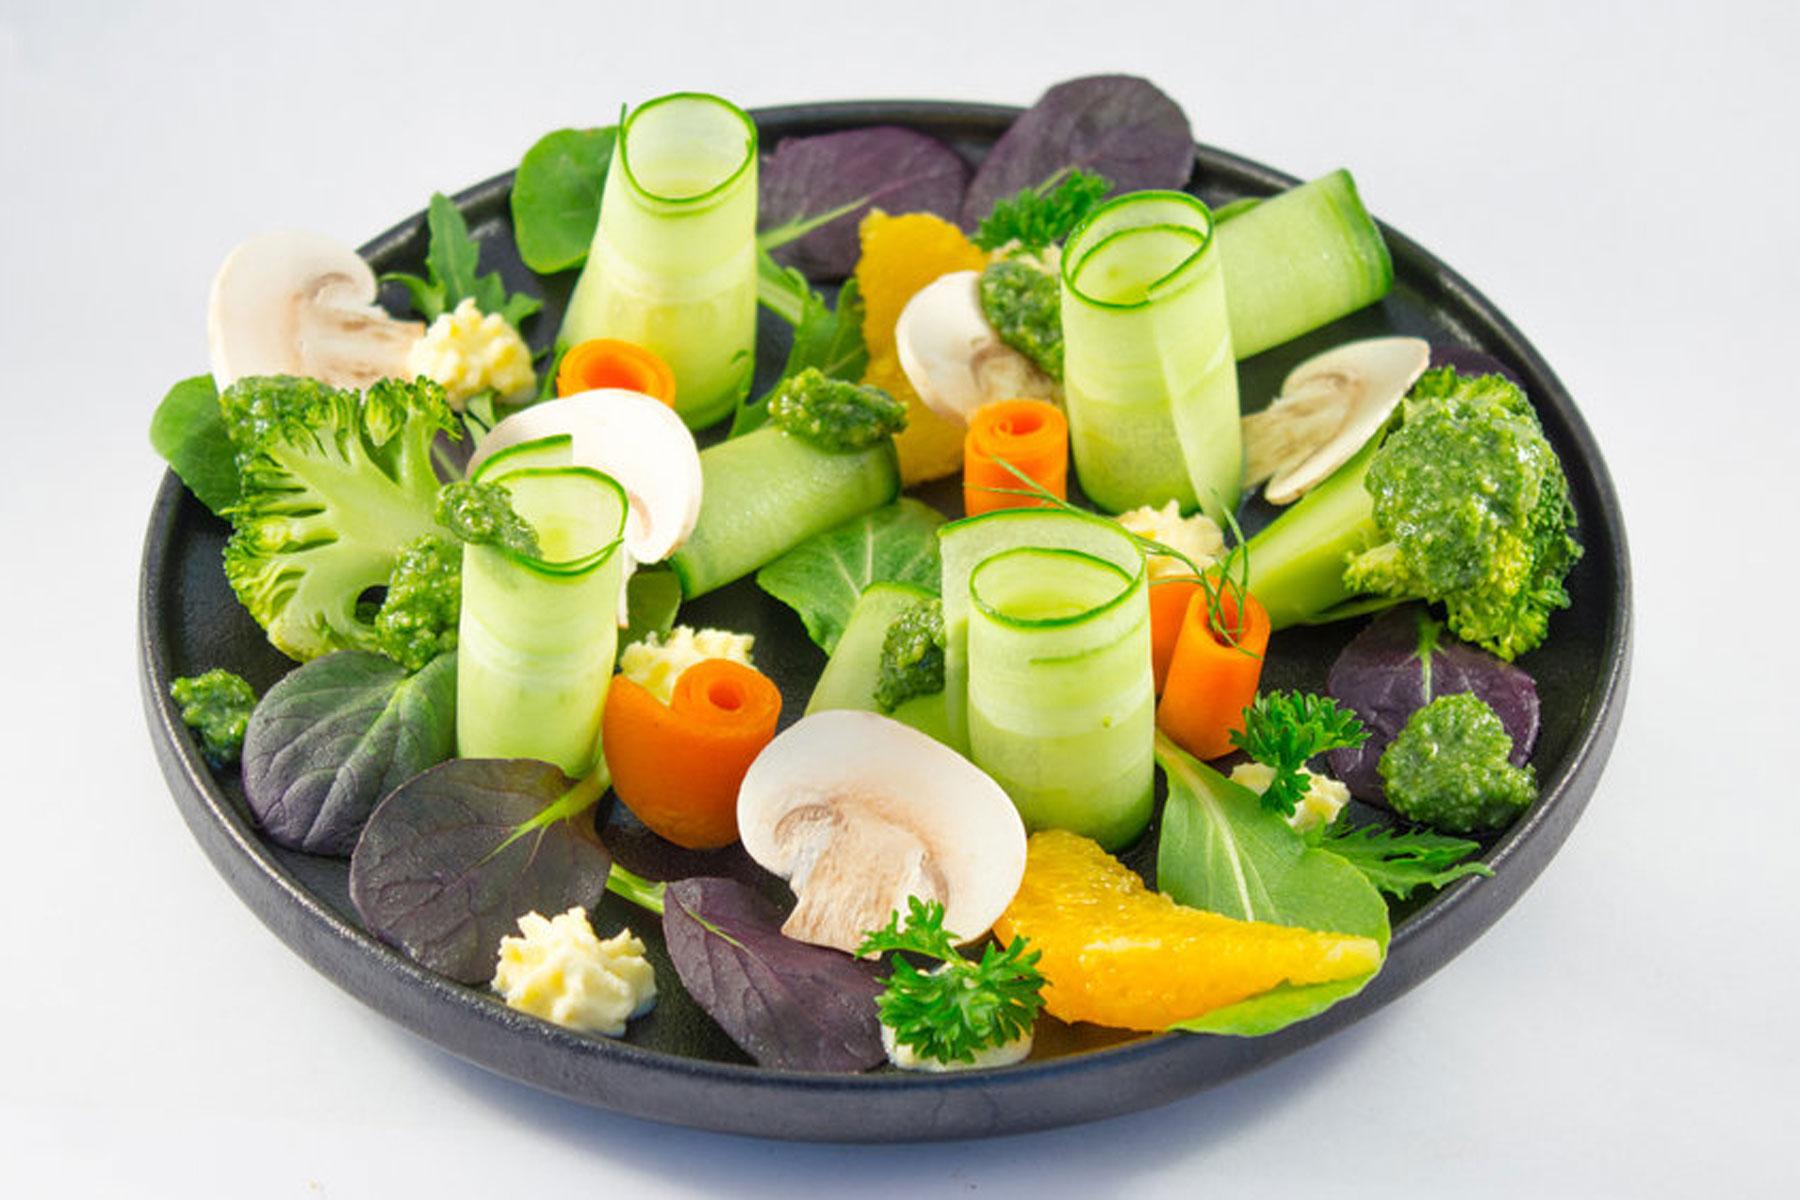 Ts auckland arno salad